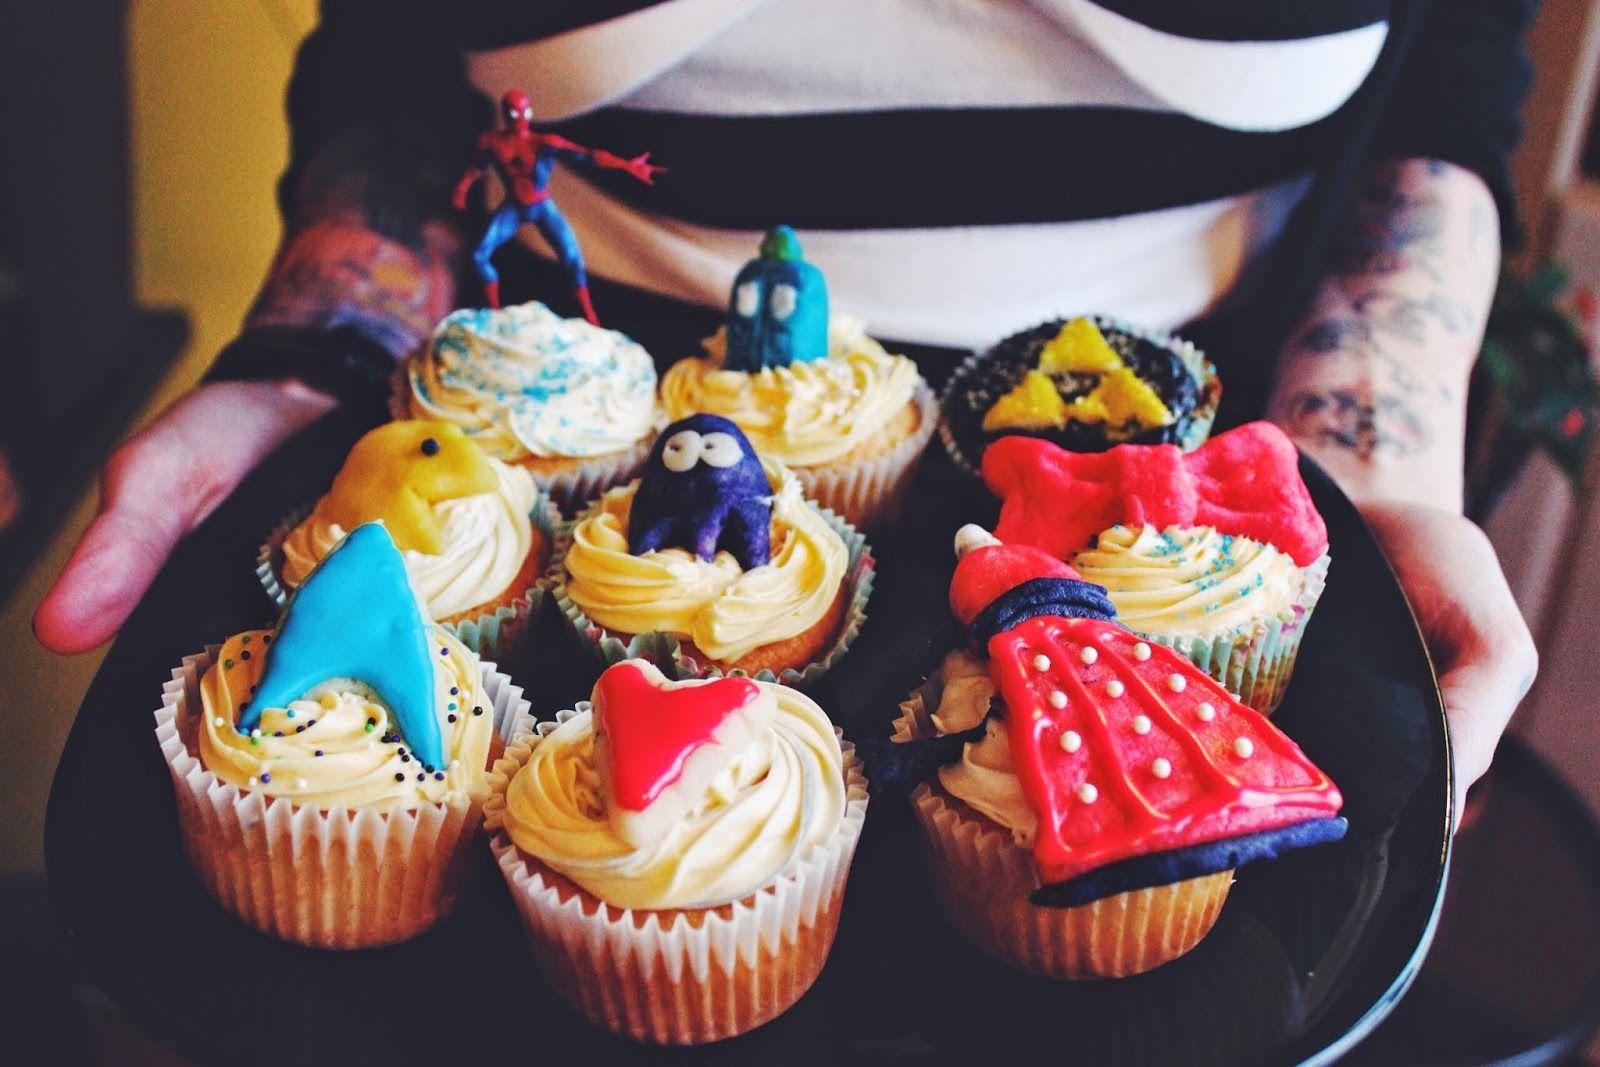 Happy Birthday Vanessa (three days later): #DIY #Geeky #Cupcakes